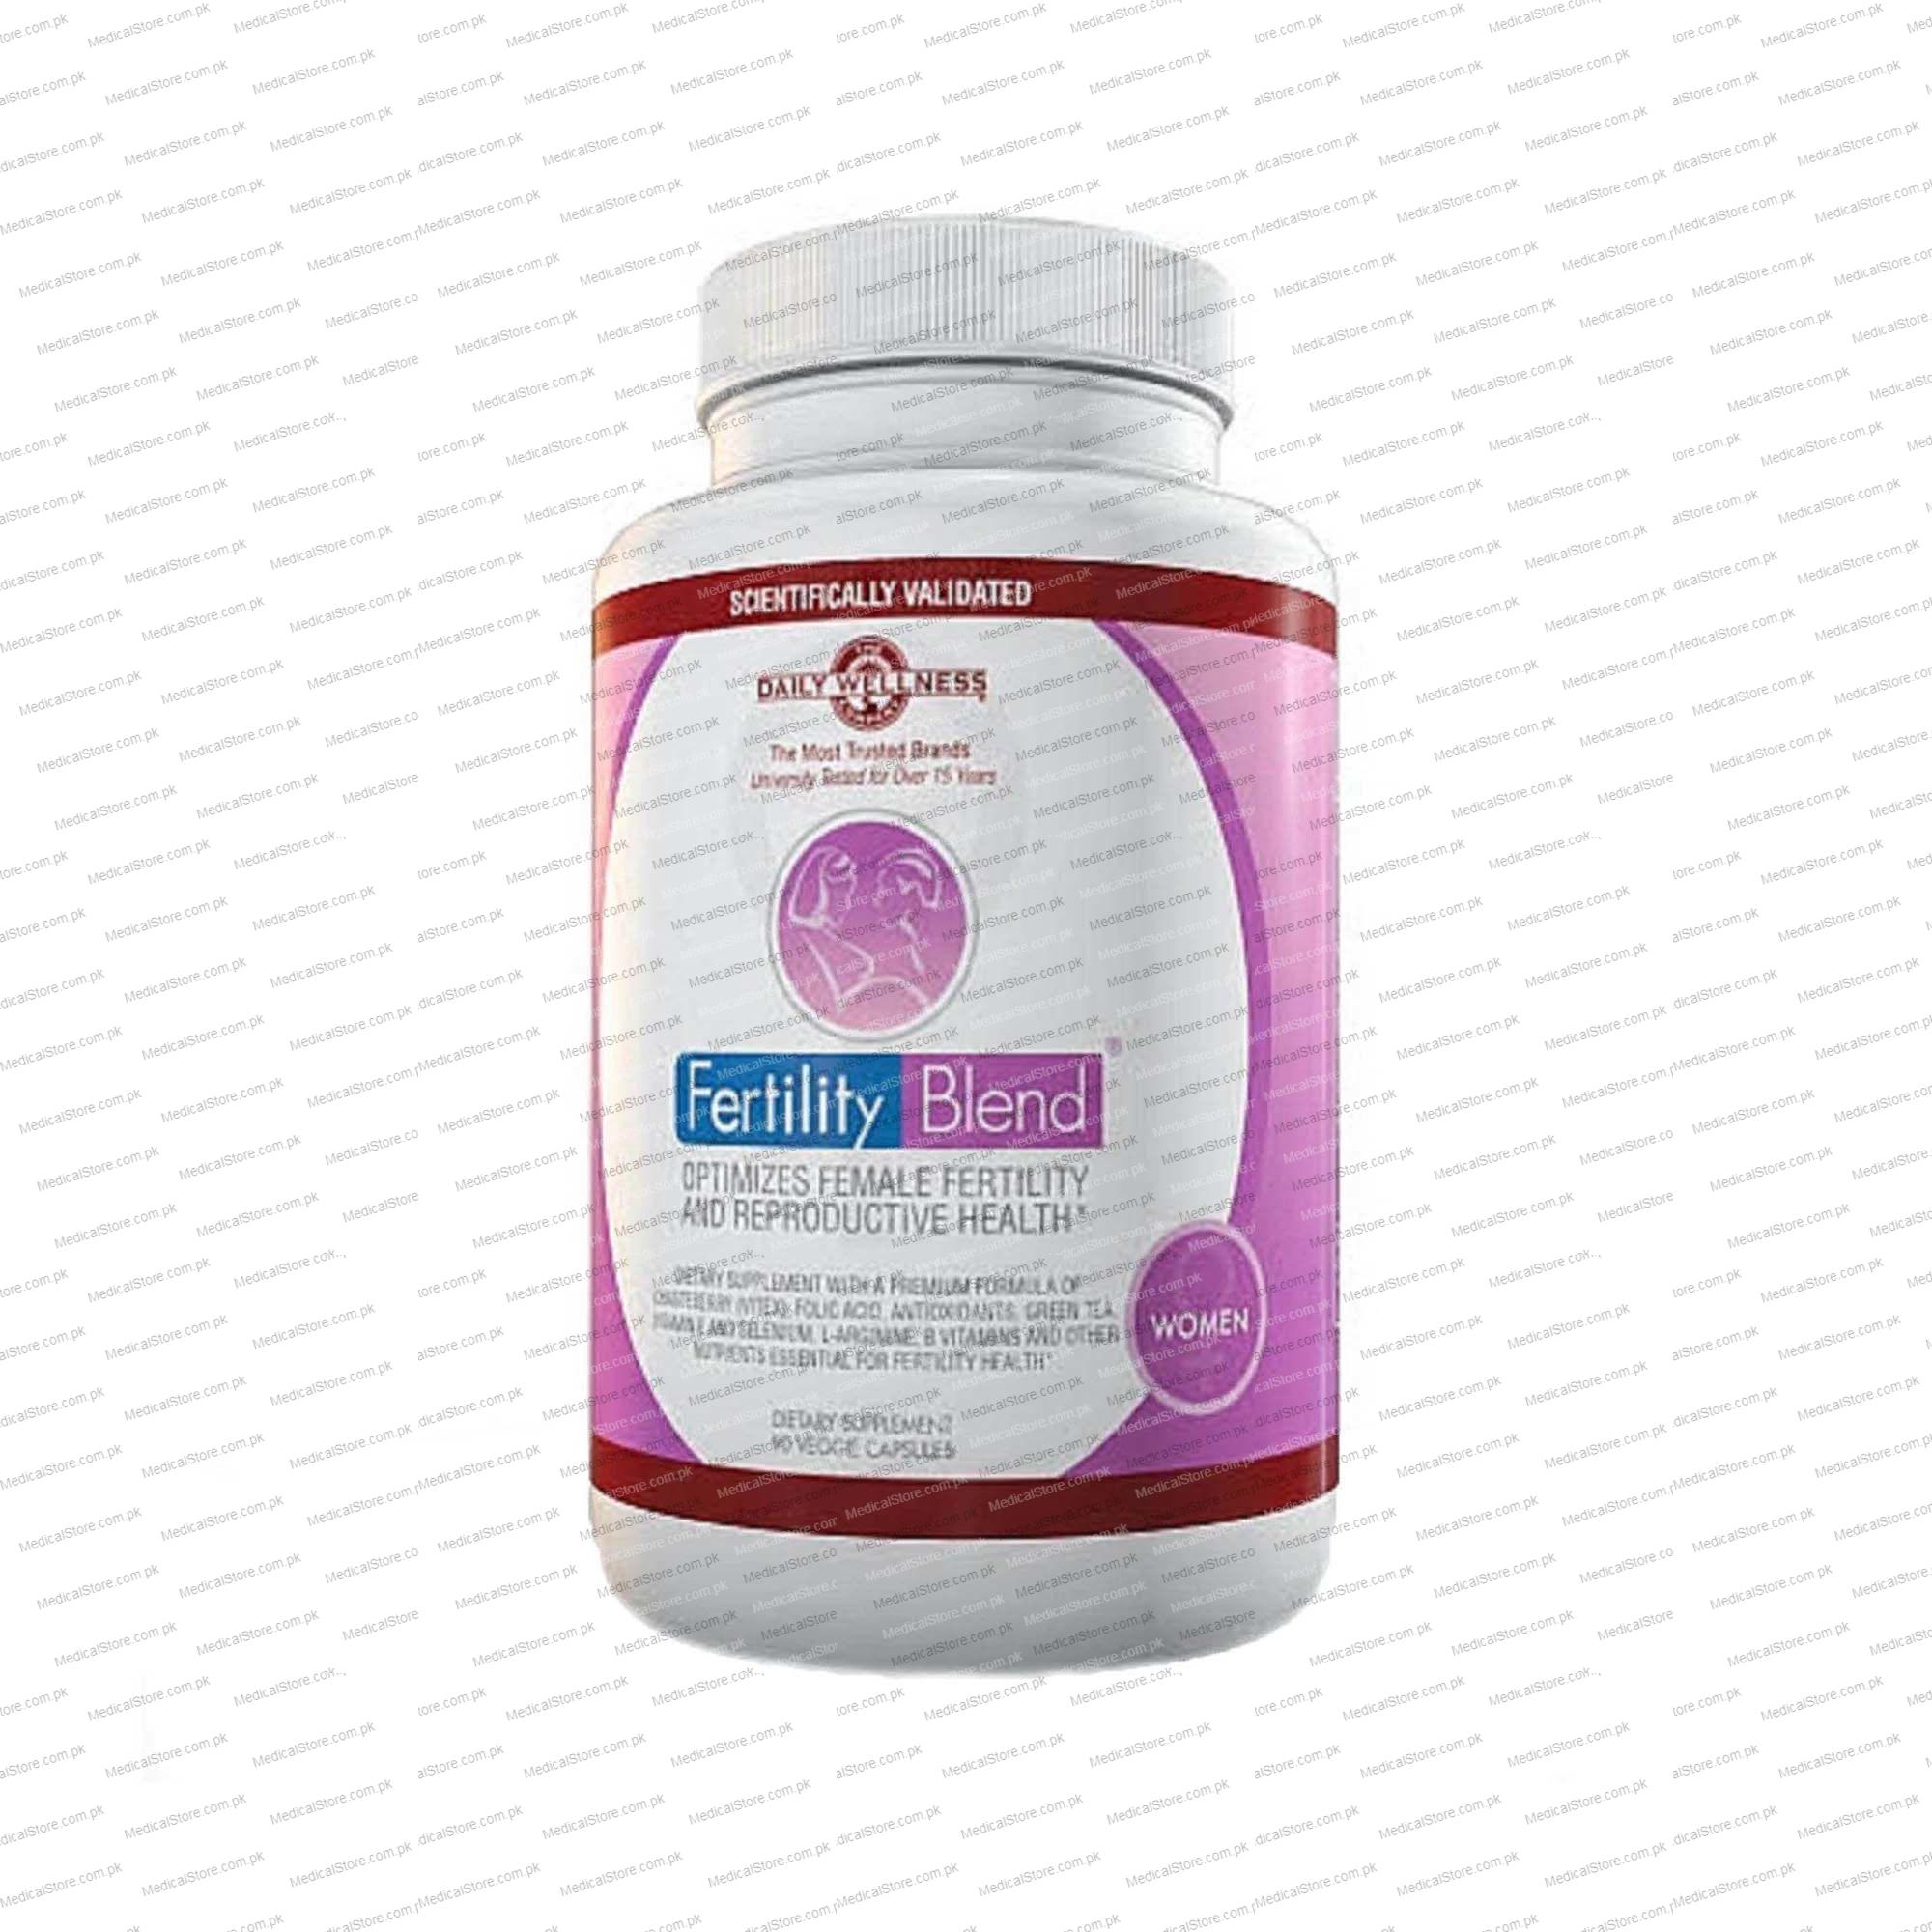 Fertility blend vitamins